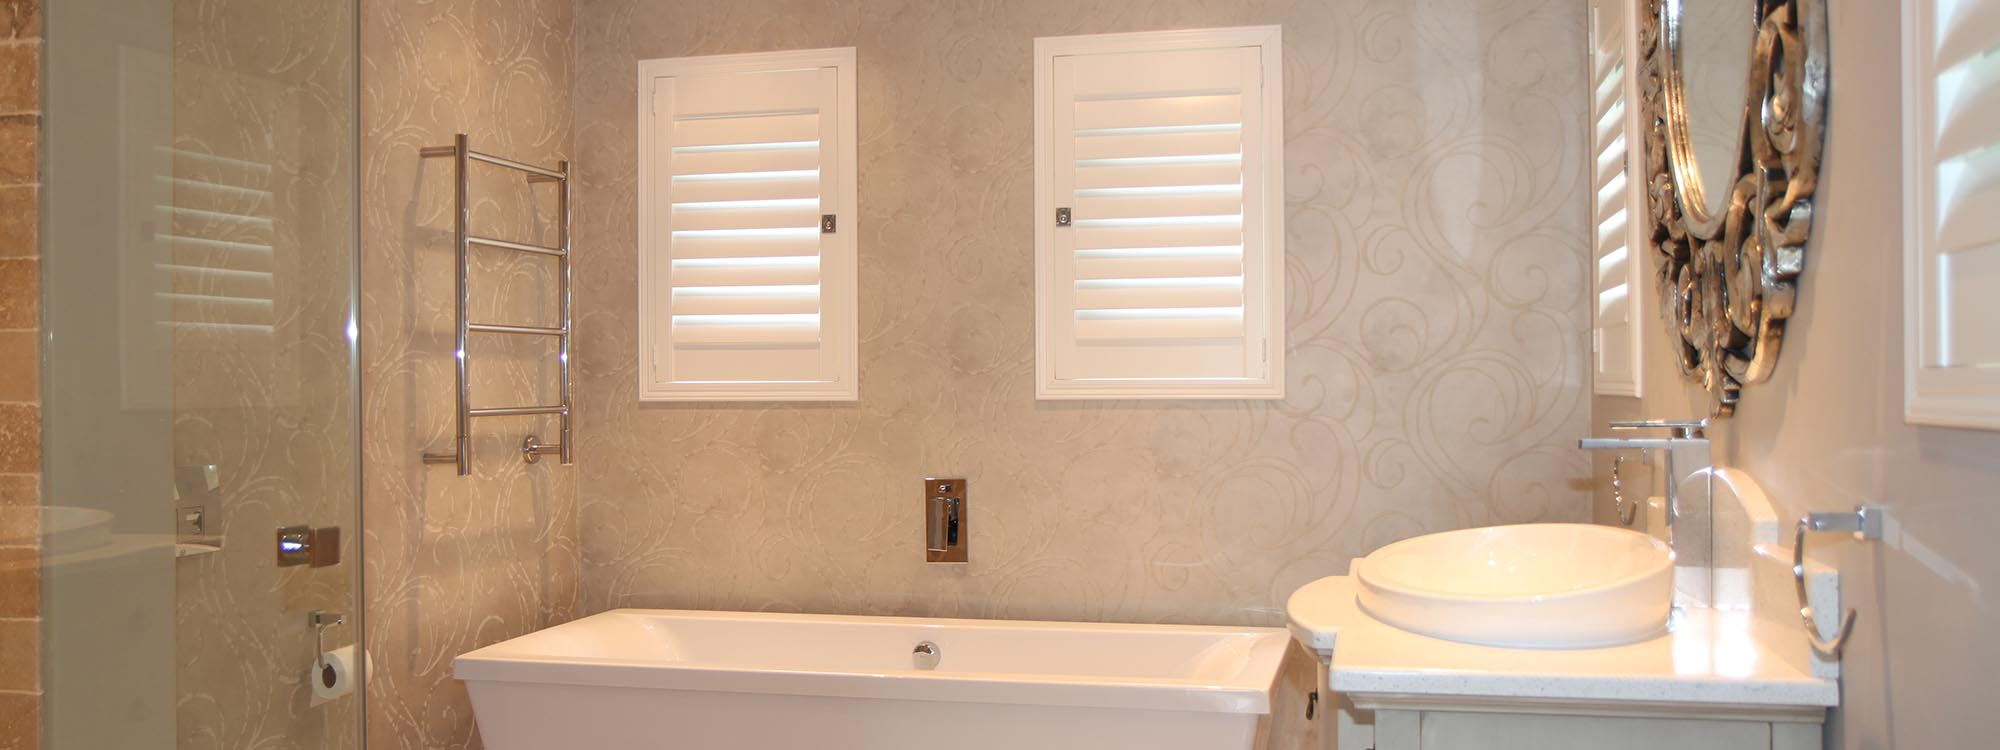 Decowood-shutters-bathroom-hinged-full-view